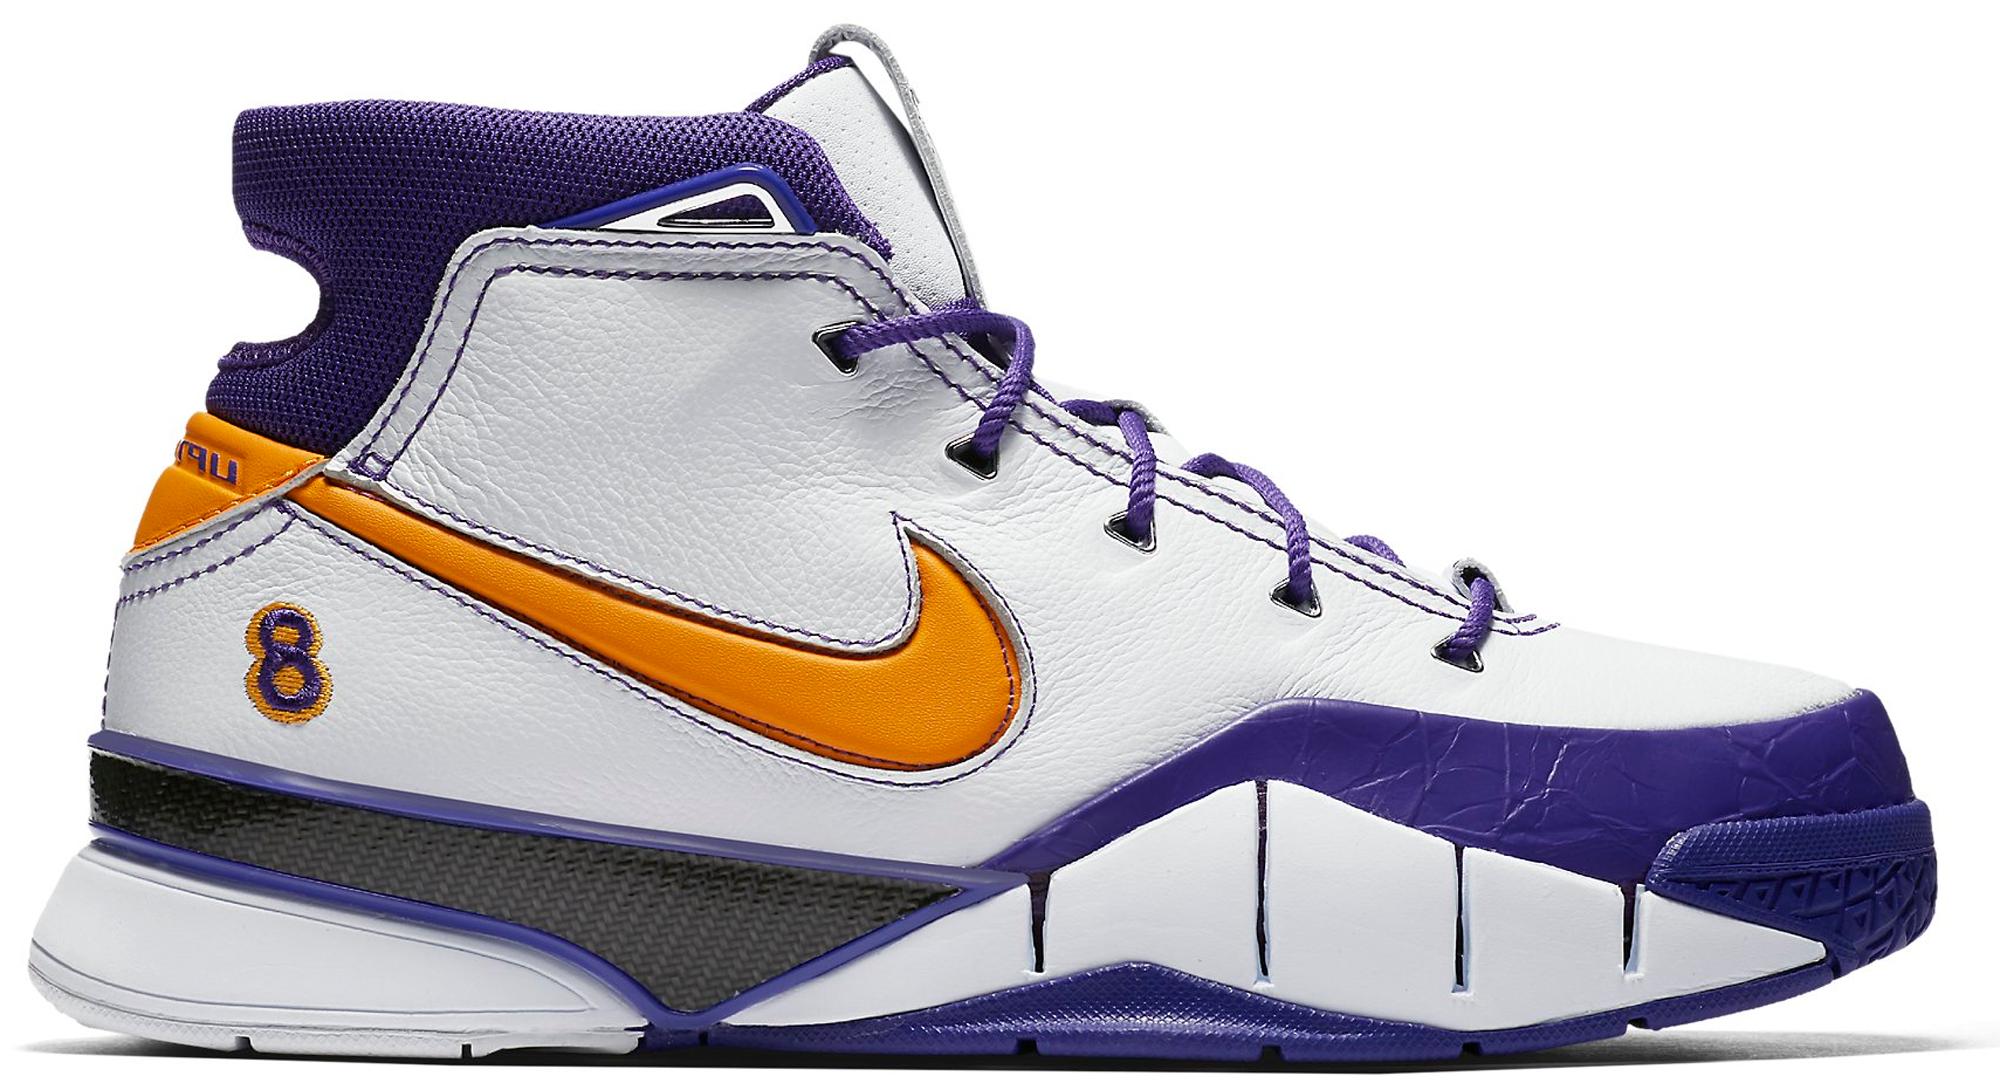 9296a0b6a077 Nike Kobe 1 Protro Think 16